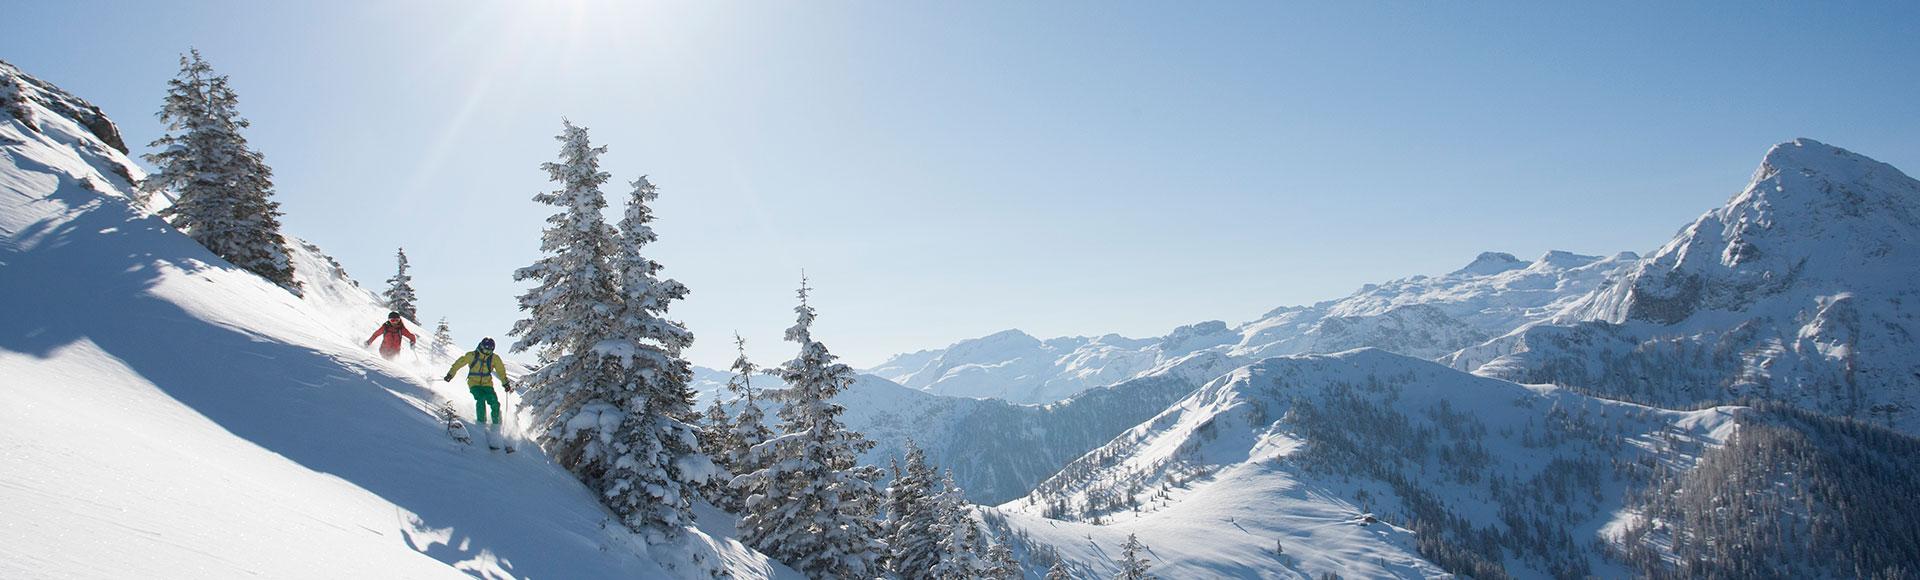 Winter- & Skiurlaub in Wagrain-Kleinarl